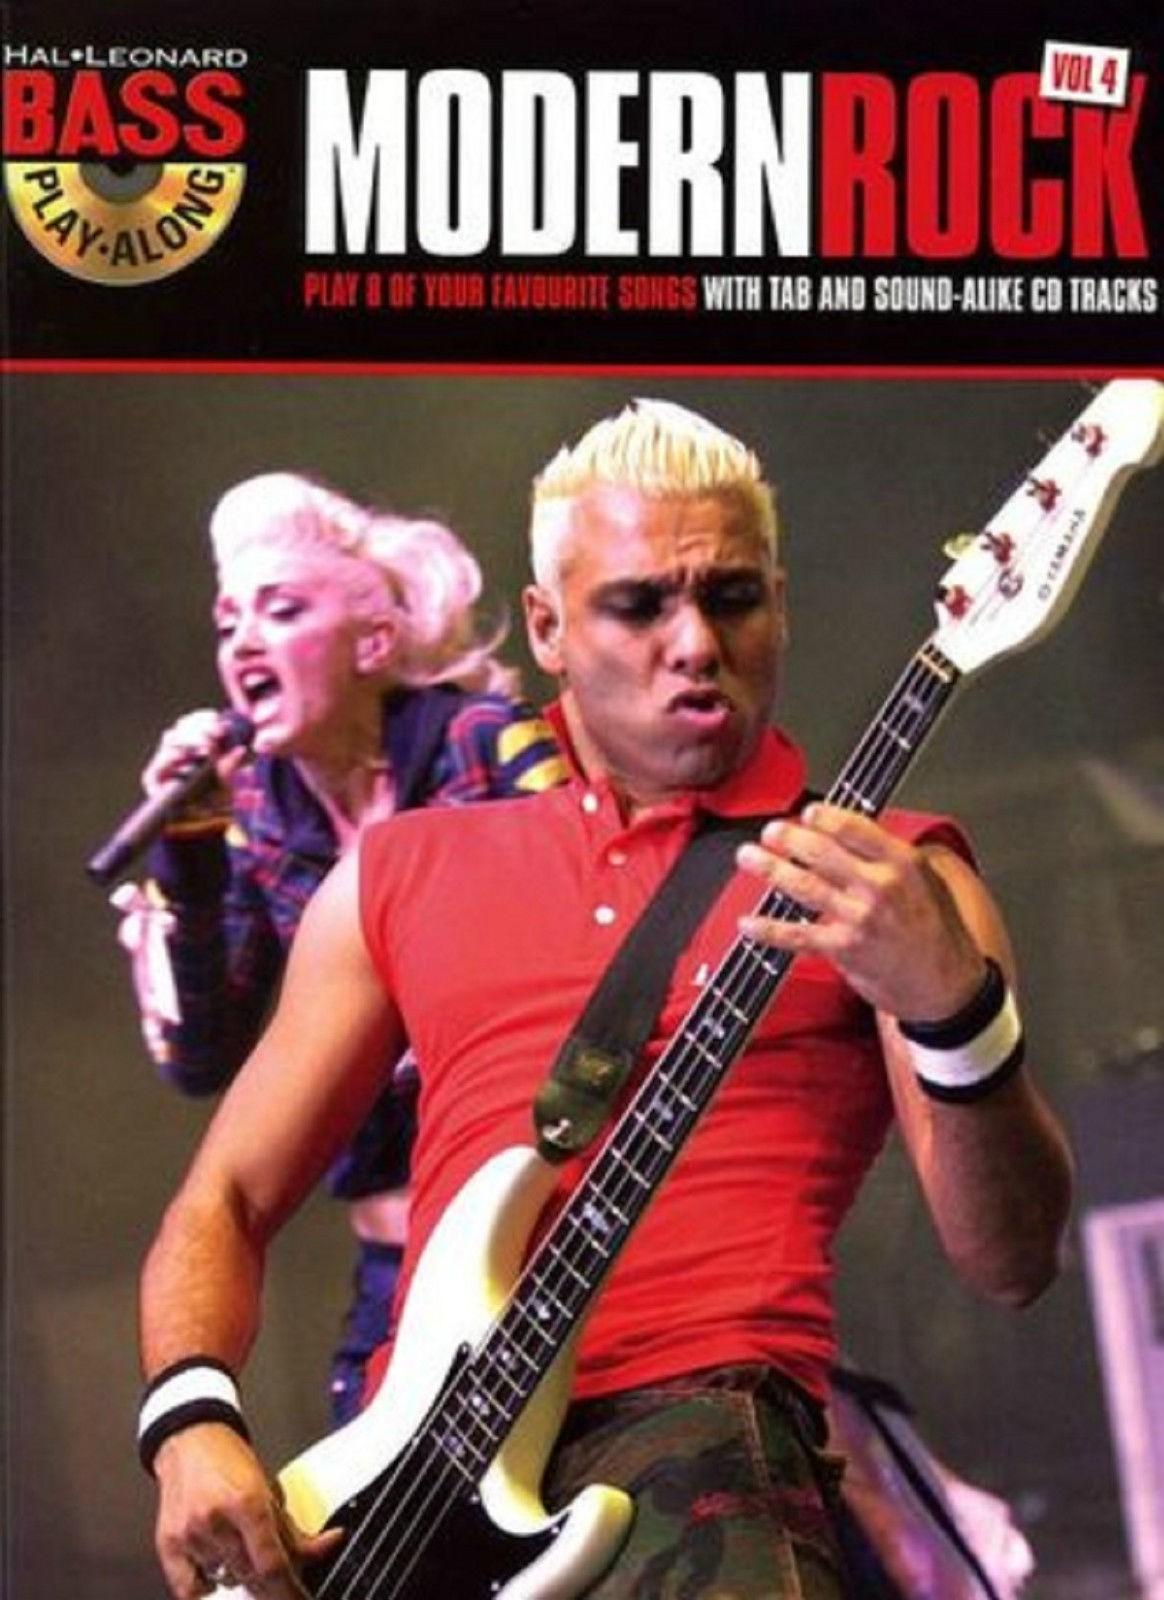 Bass Play Along Modern Rock Vol 4 Songbook CD Guitar Tab Weezer Pearl Jam S95